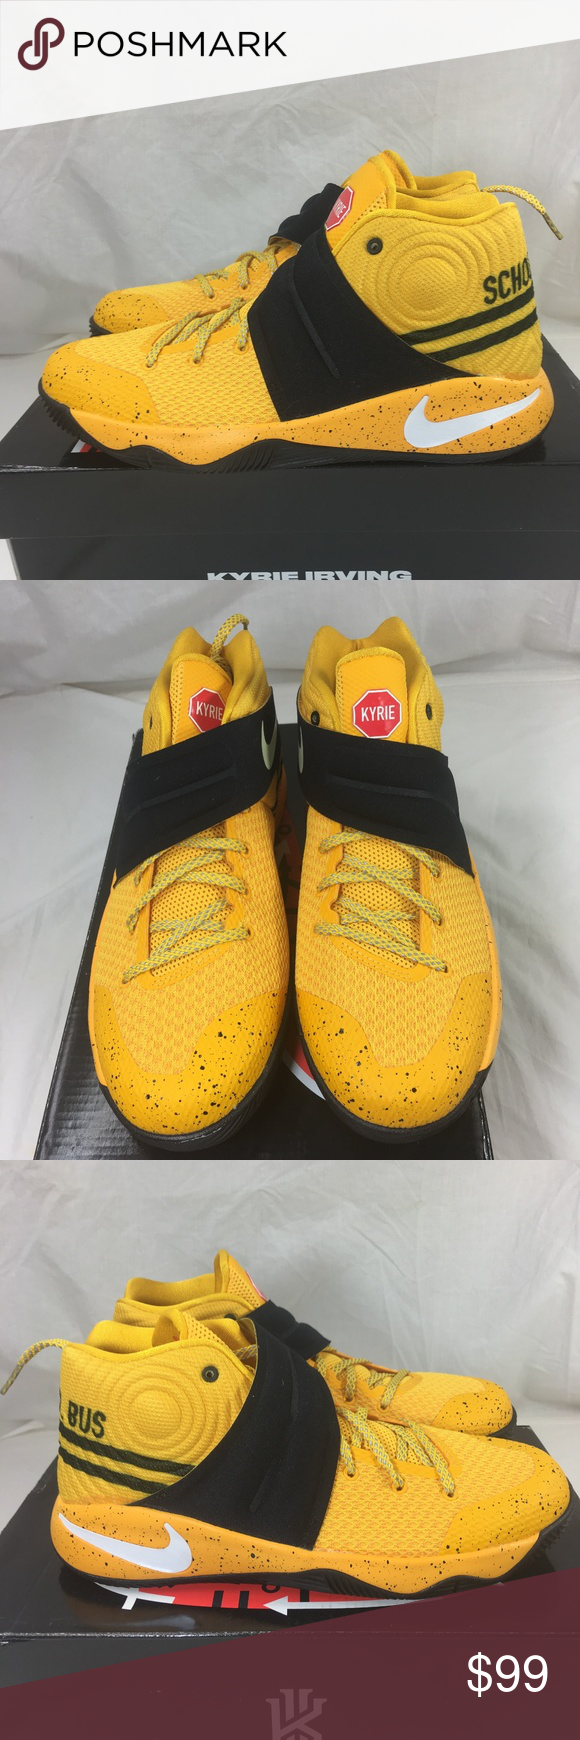 6d2a73b400c0 Nike Air Kyrie 2 Back to School Basketball Shoe Nike Air Kyrie 2 GS  Basketball Shoes Back To School Bus Bus Yellow Nike Ser.  826673-700 Multi  sizes Brand ...